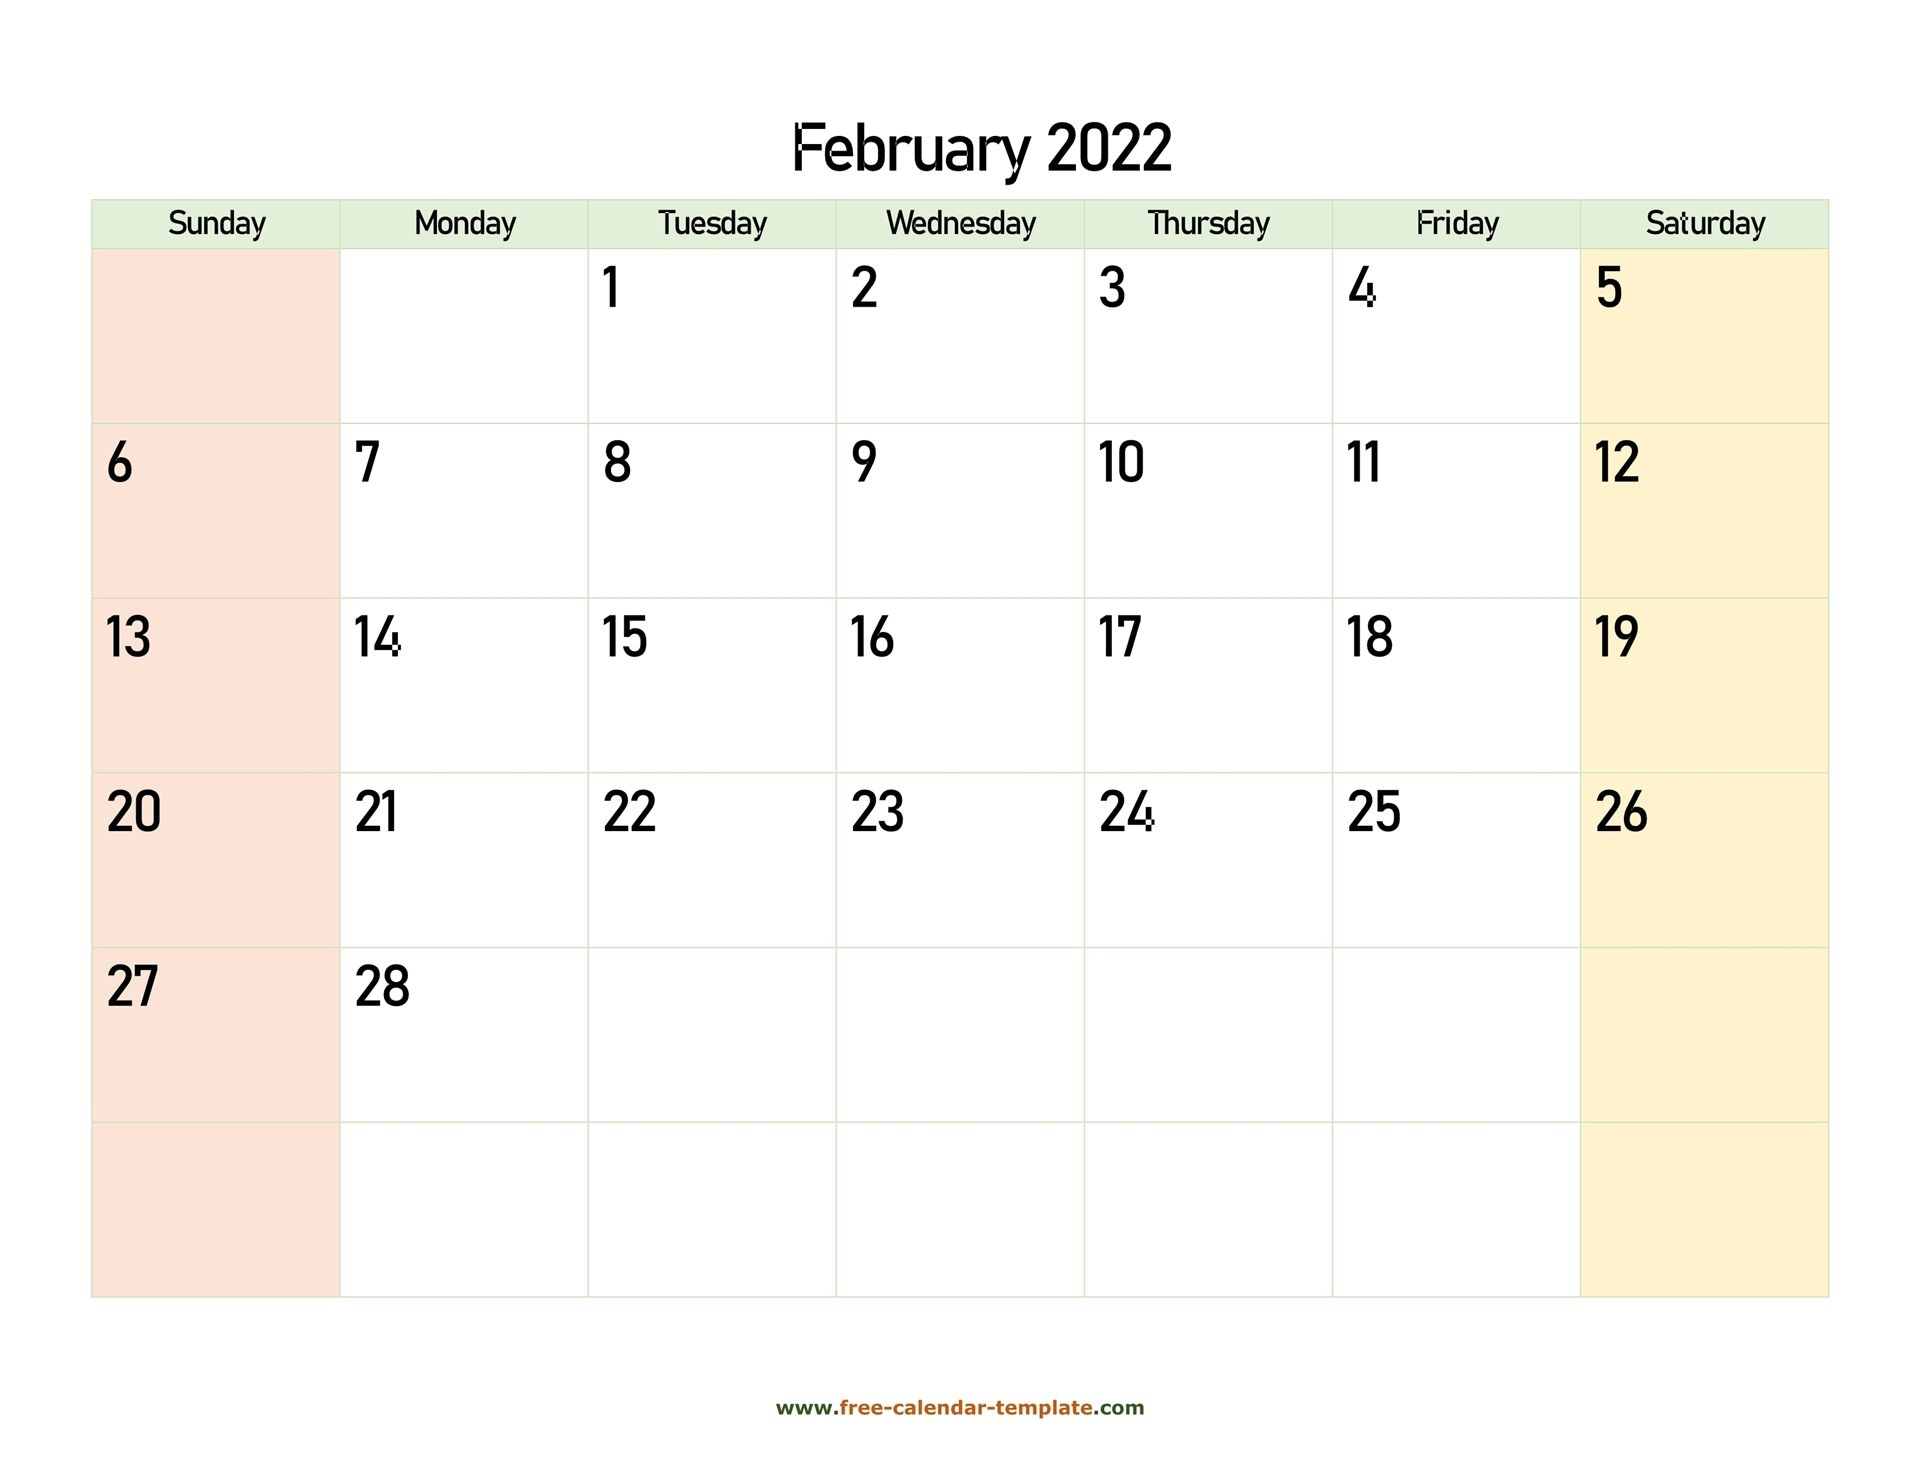 February 2022 Free Calendar Tempplate | Free-Calendar